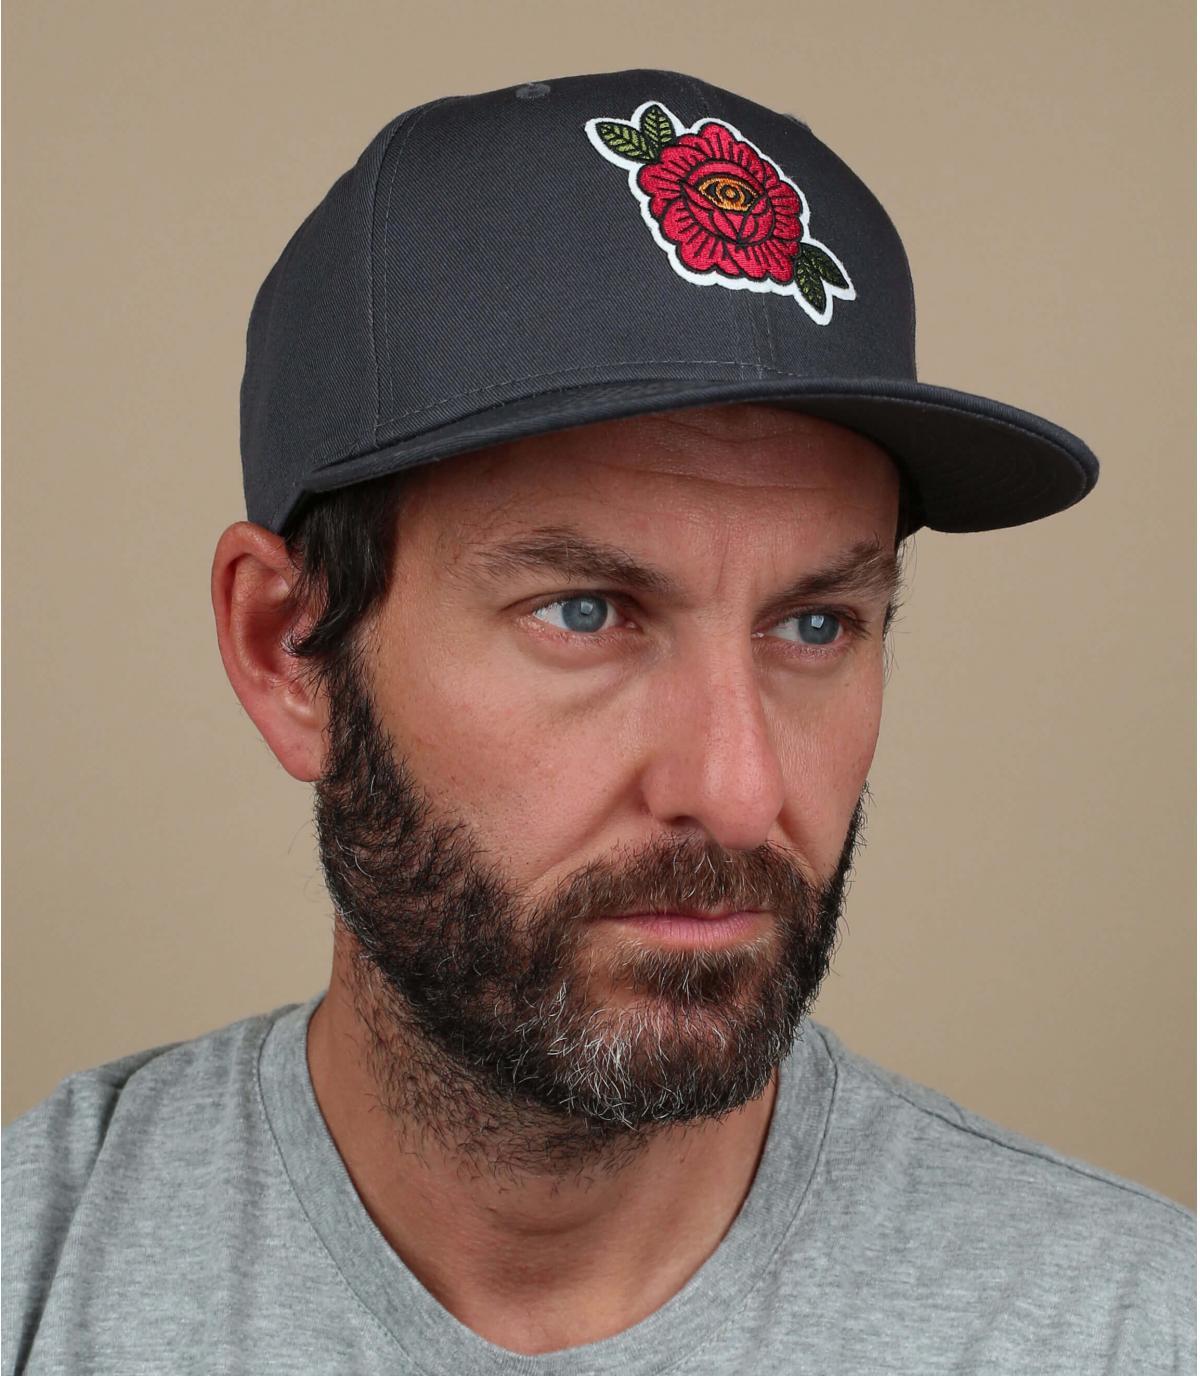 Black cap rose embroidery